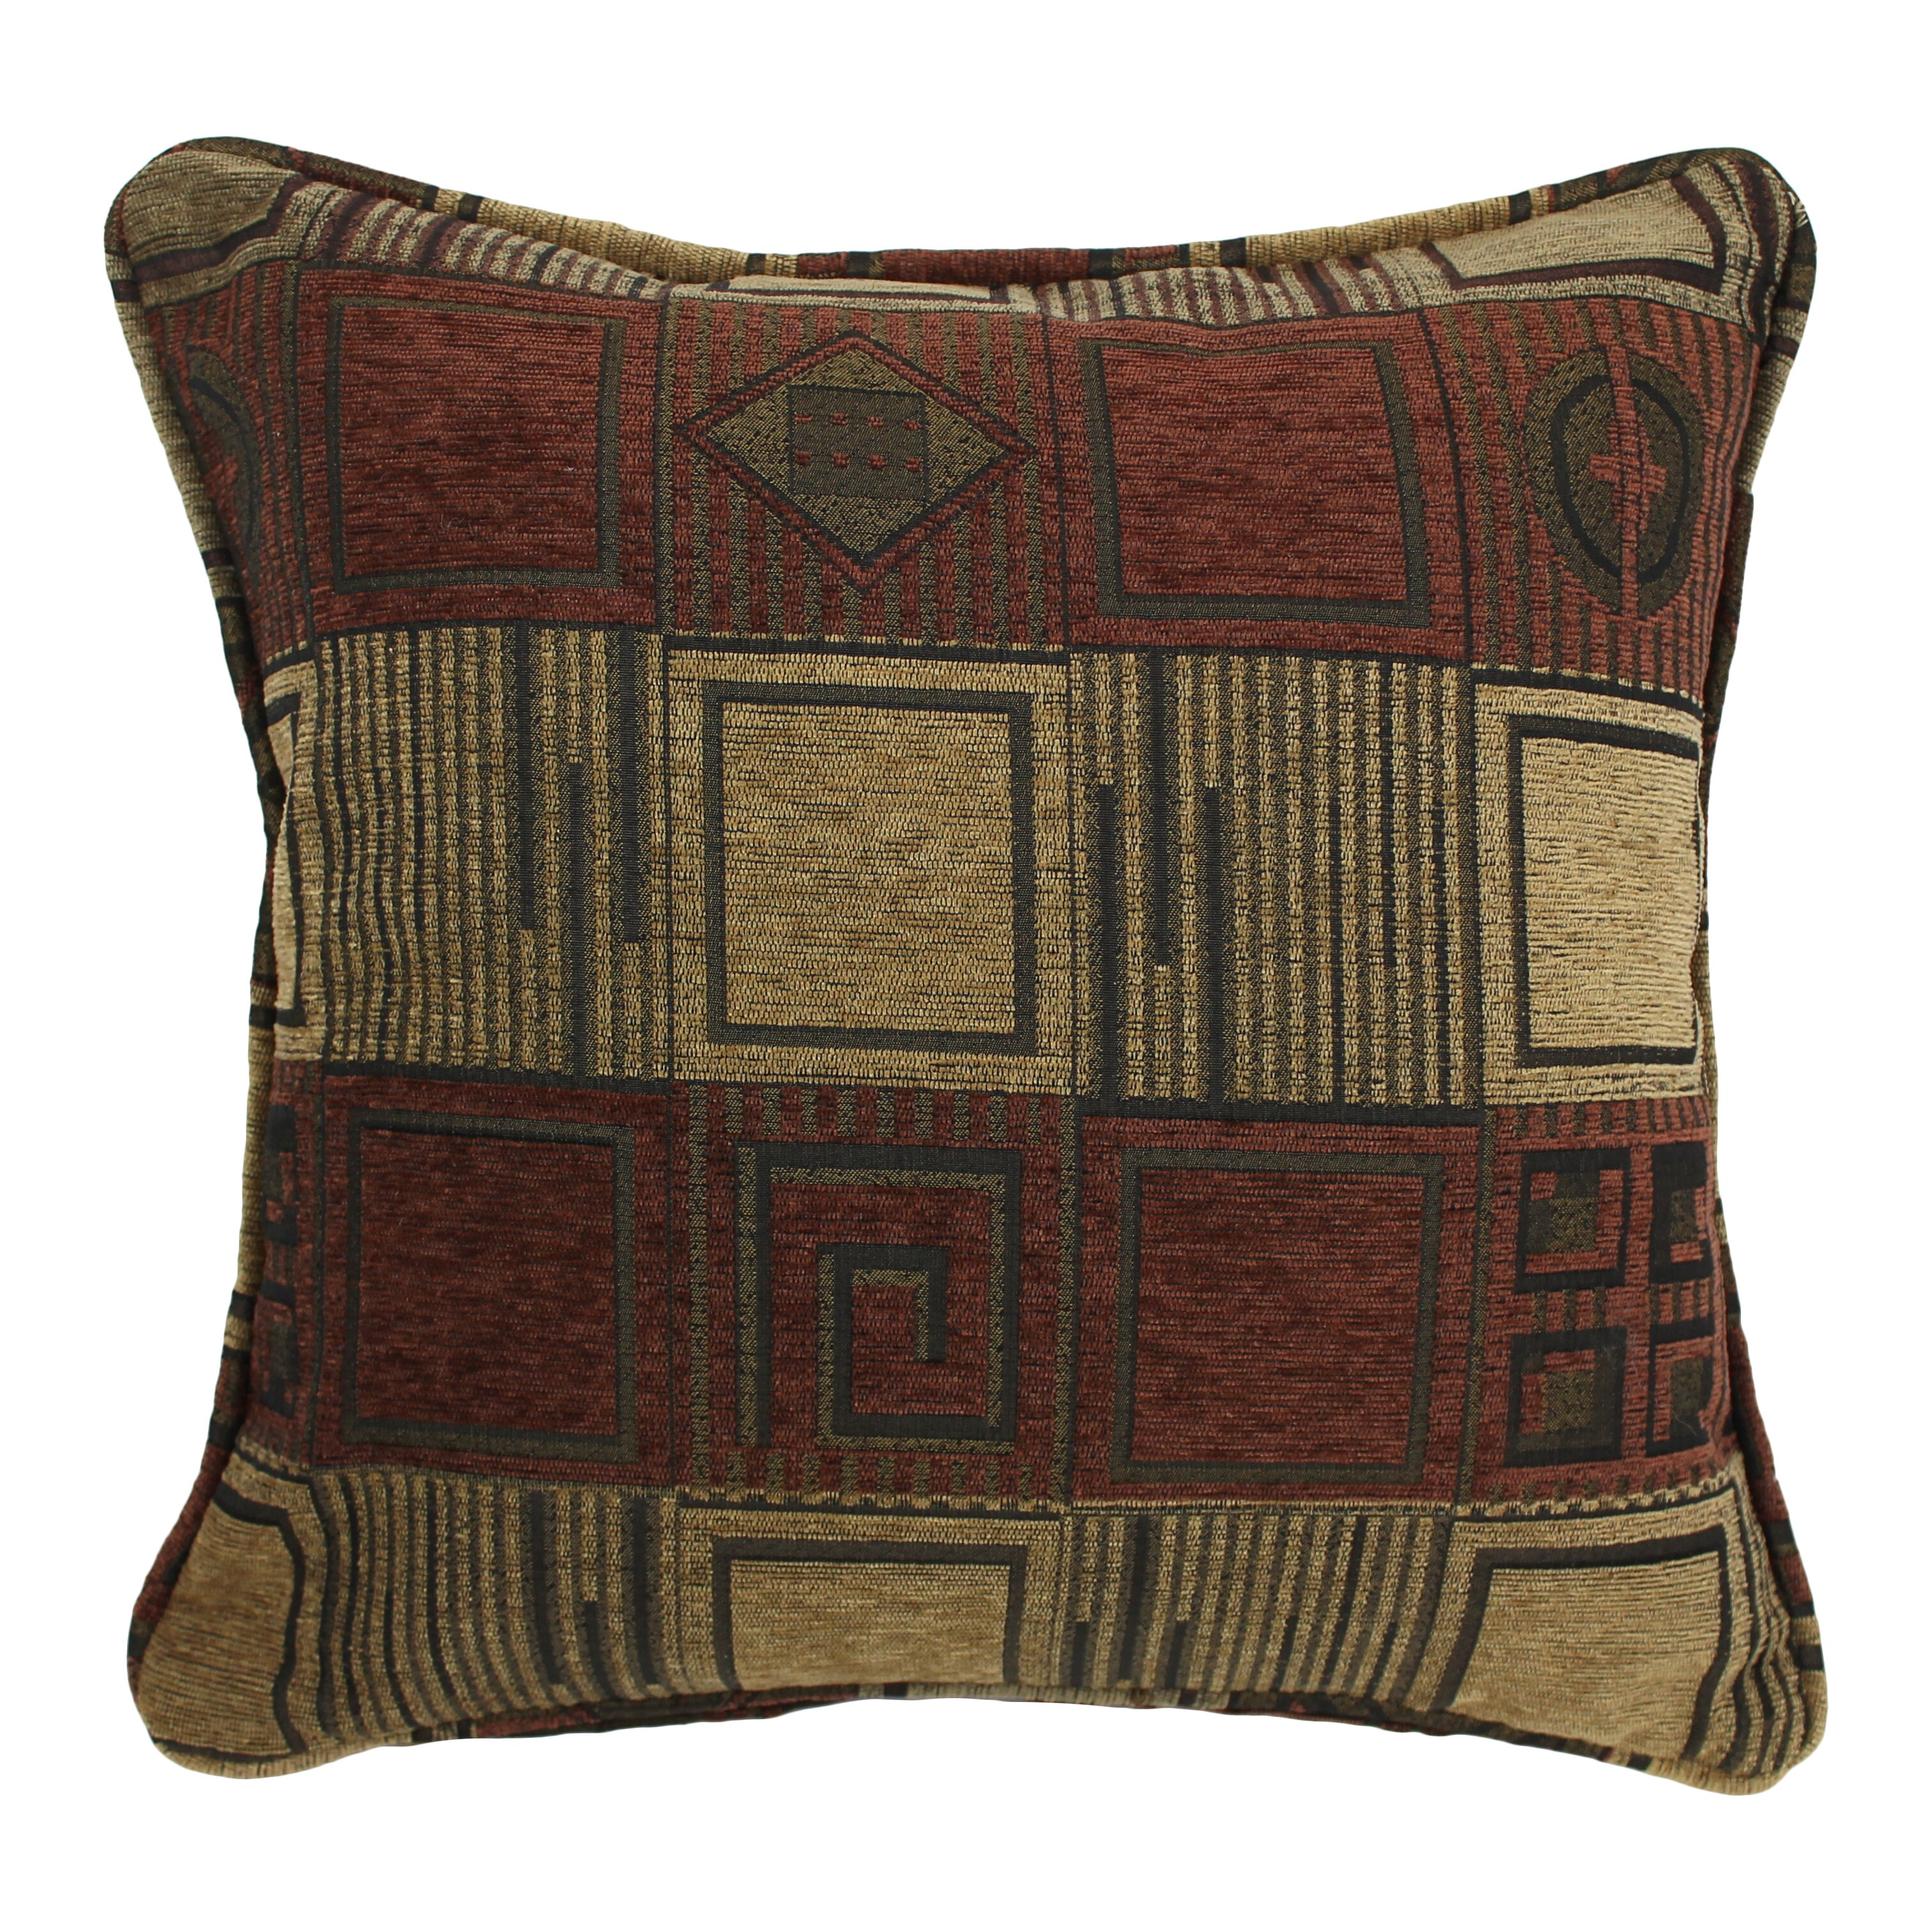 Chenille Throw Pillows Set Of 2 : Blazing Needles Jaquard Chenille Throw Pillow Wayfair